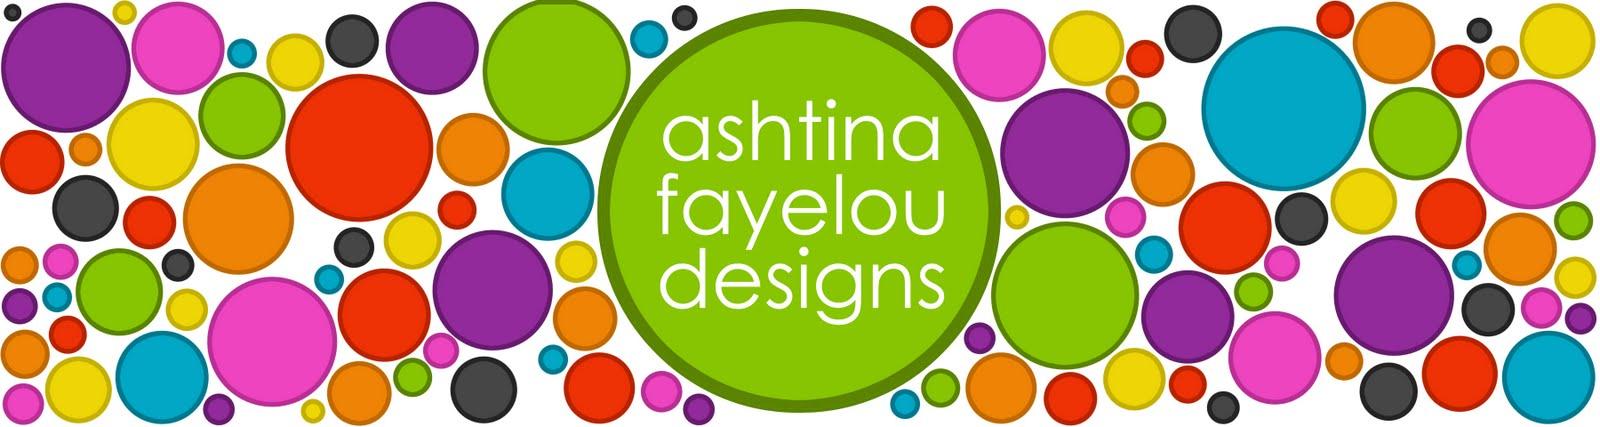 ashtina fayelou designs